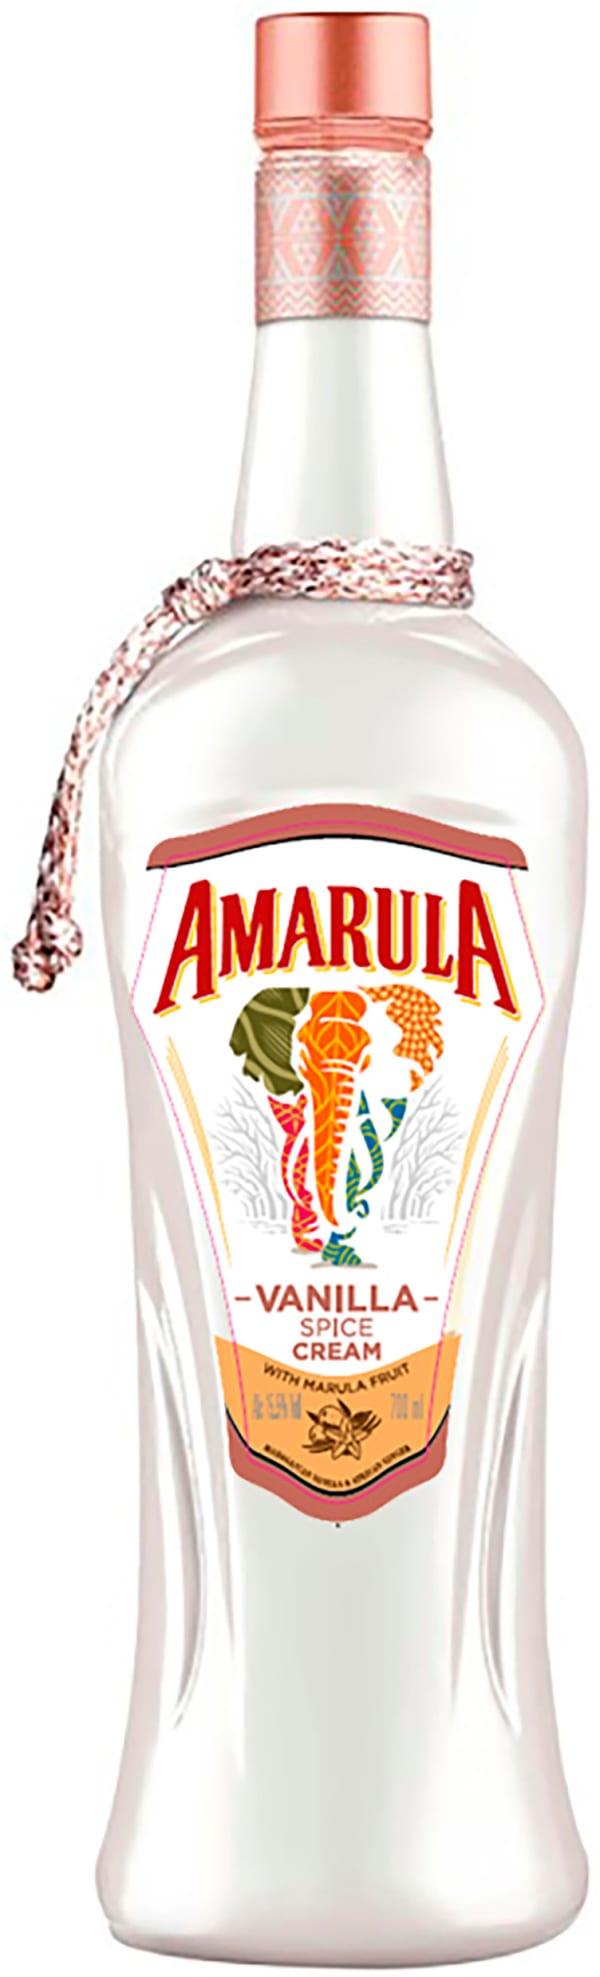 Amarula Vanilla Spice